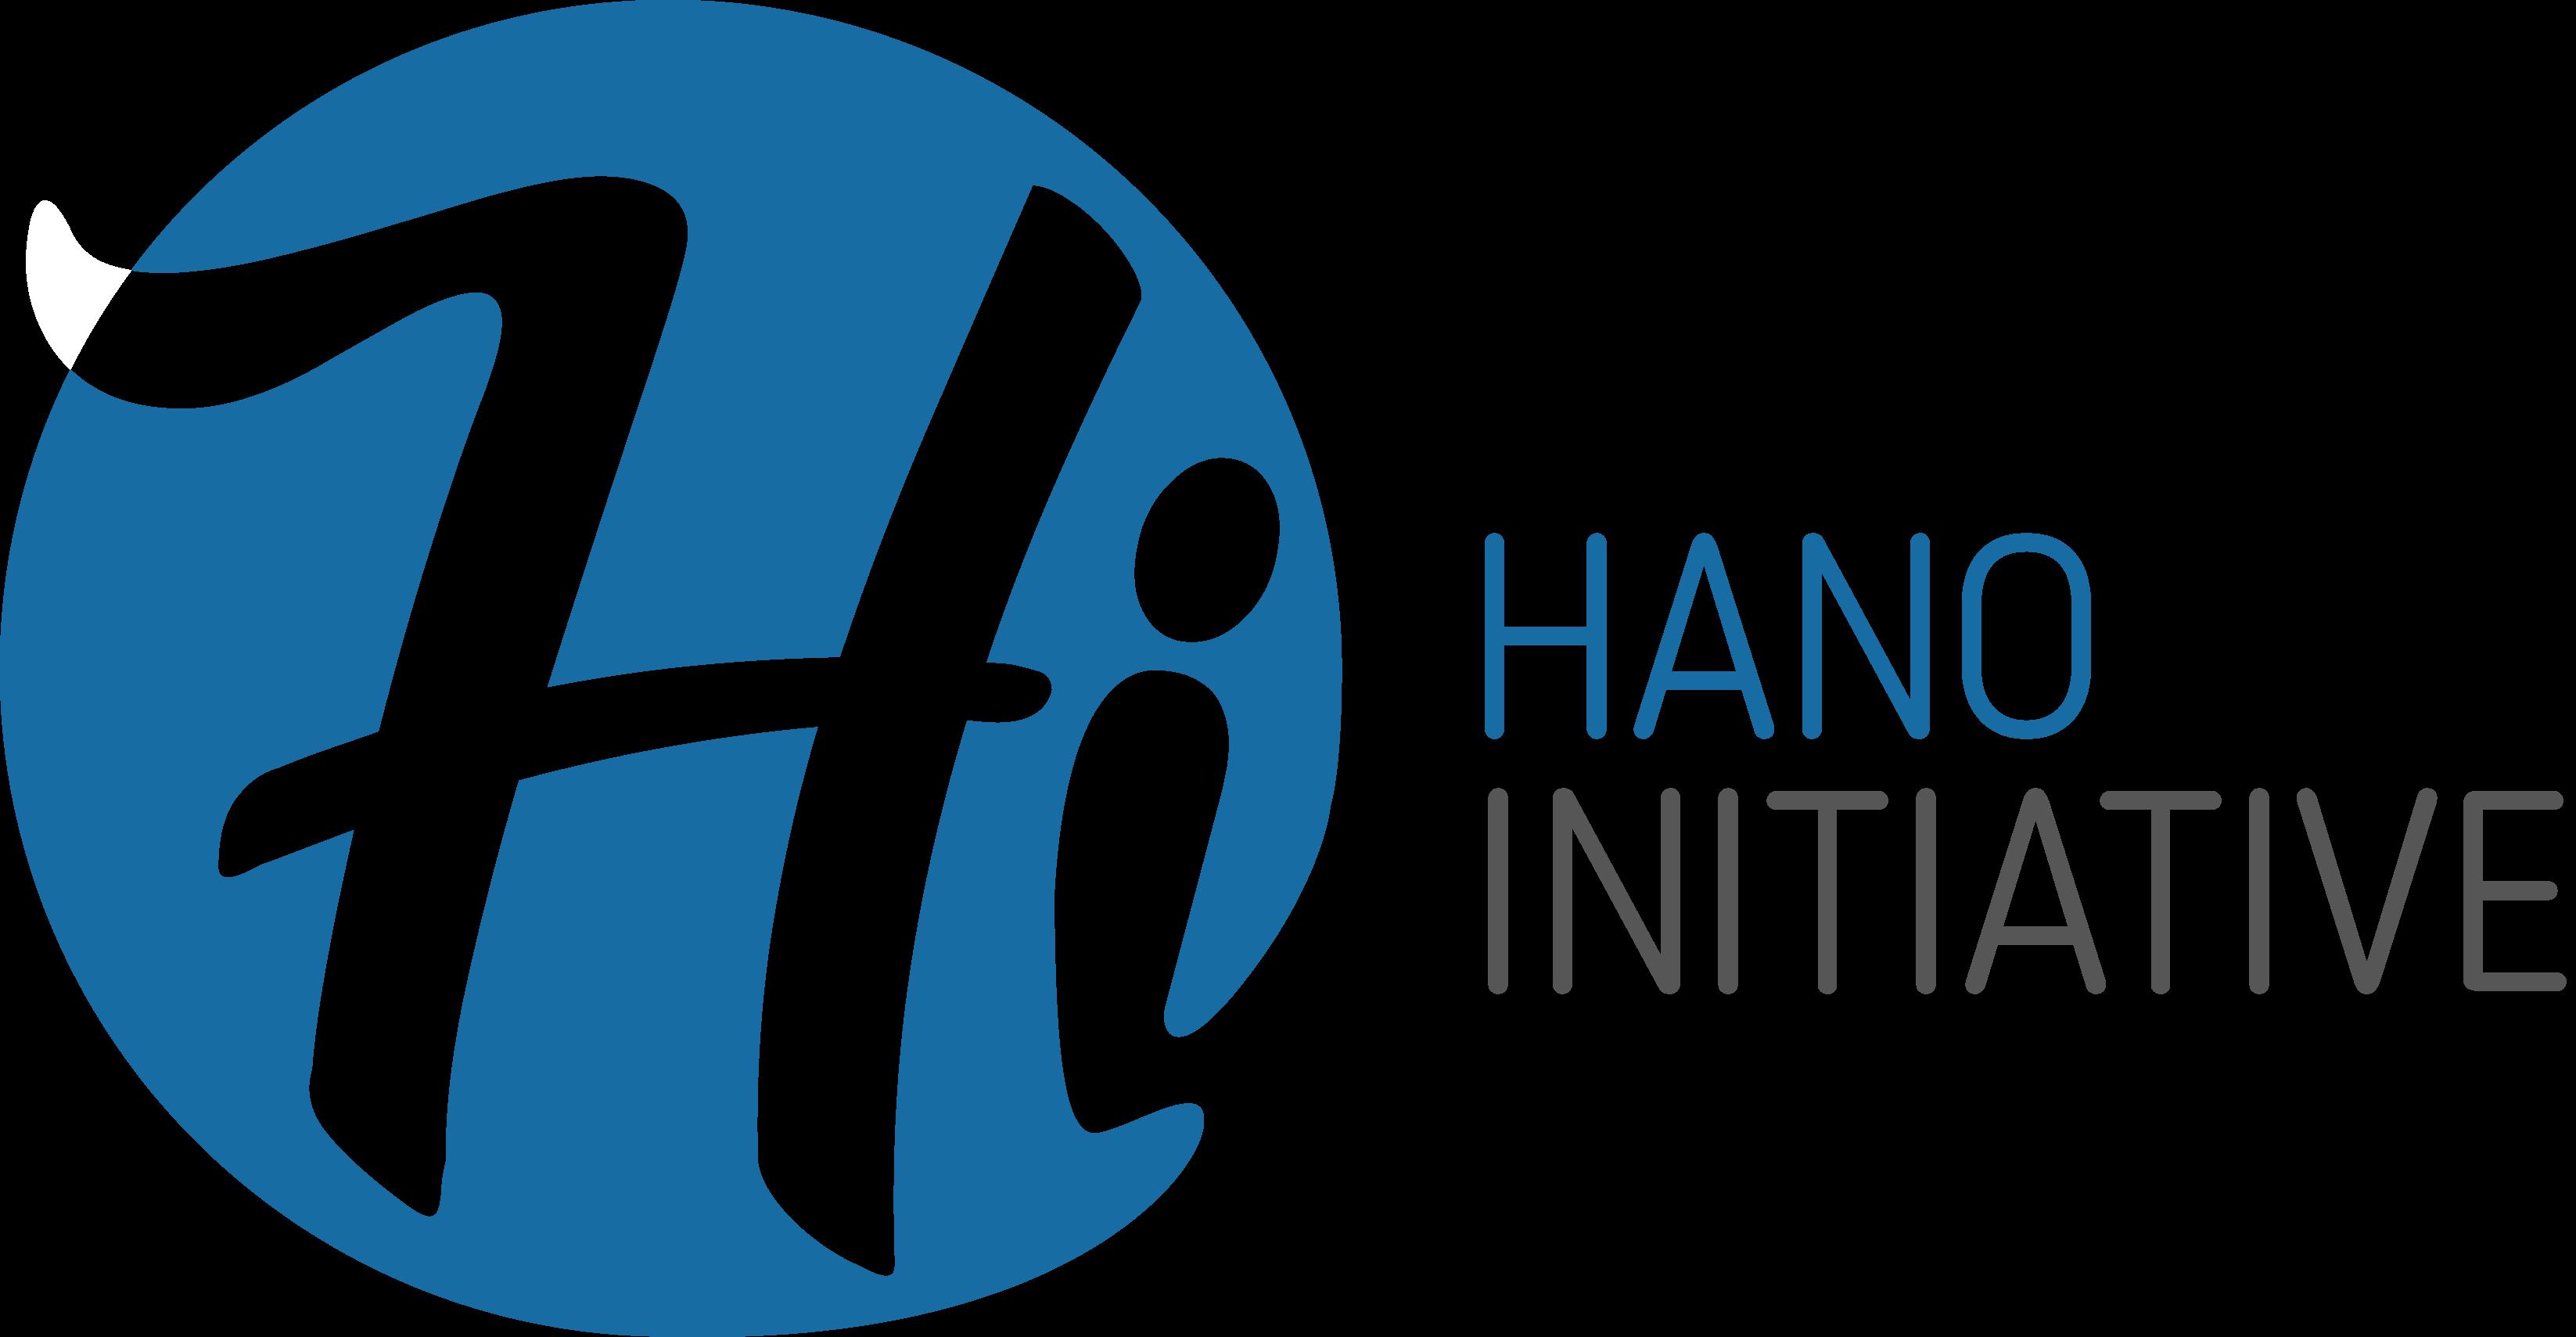 Hano Initiative